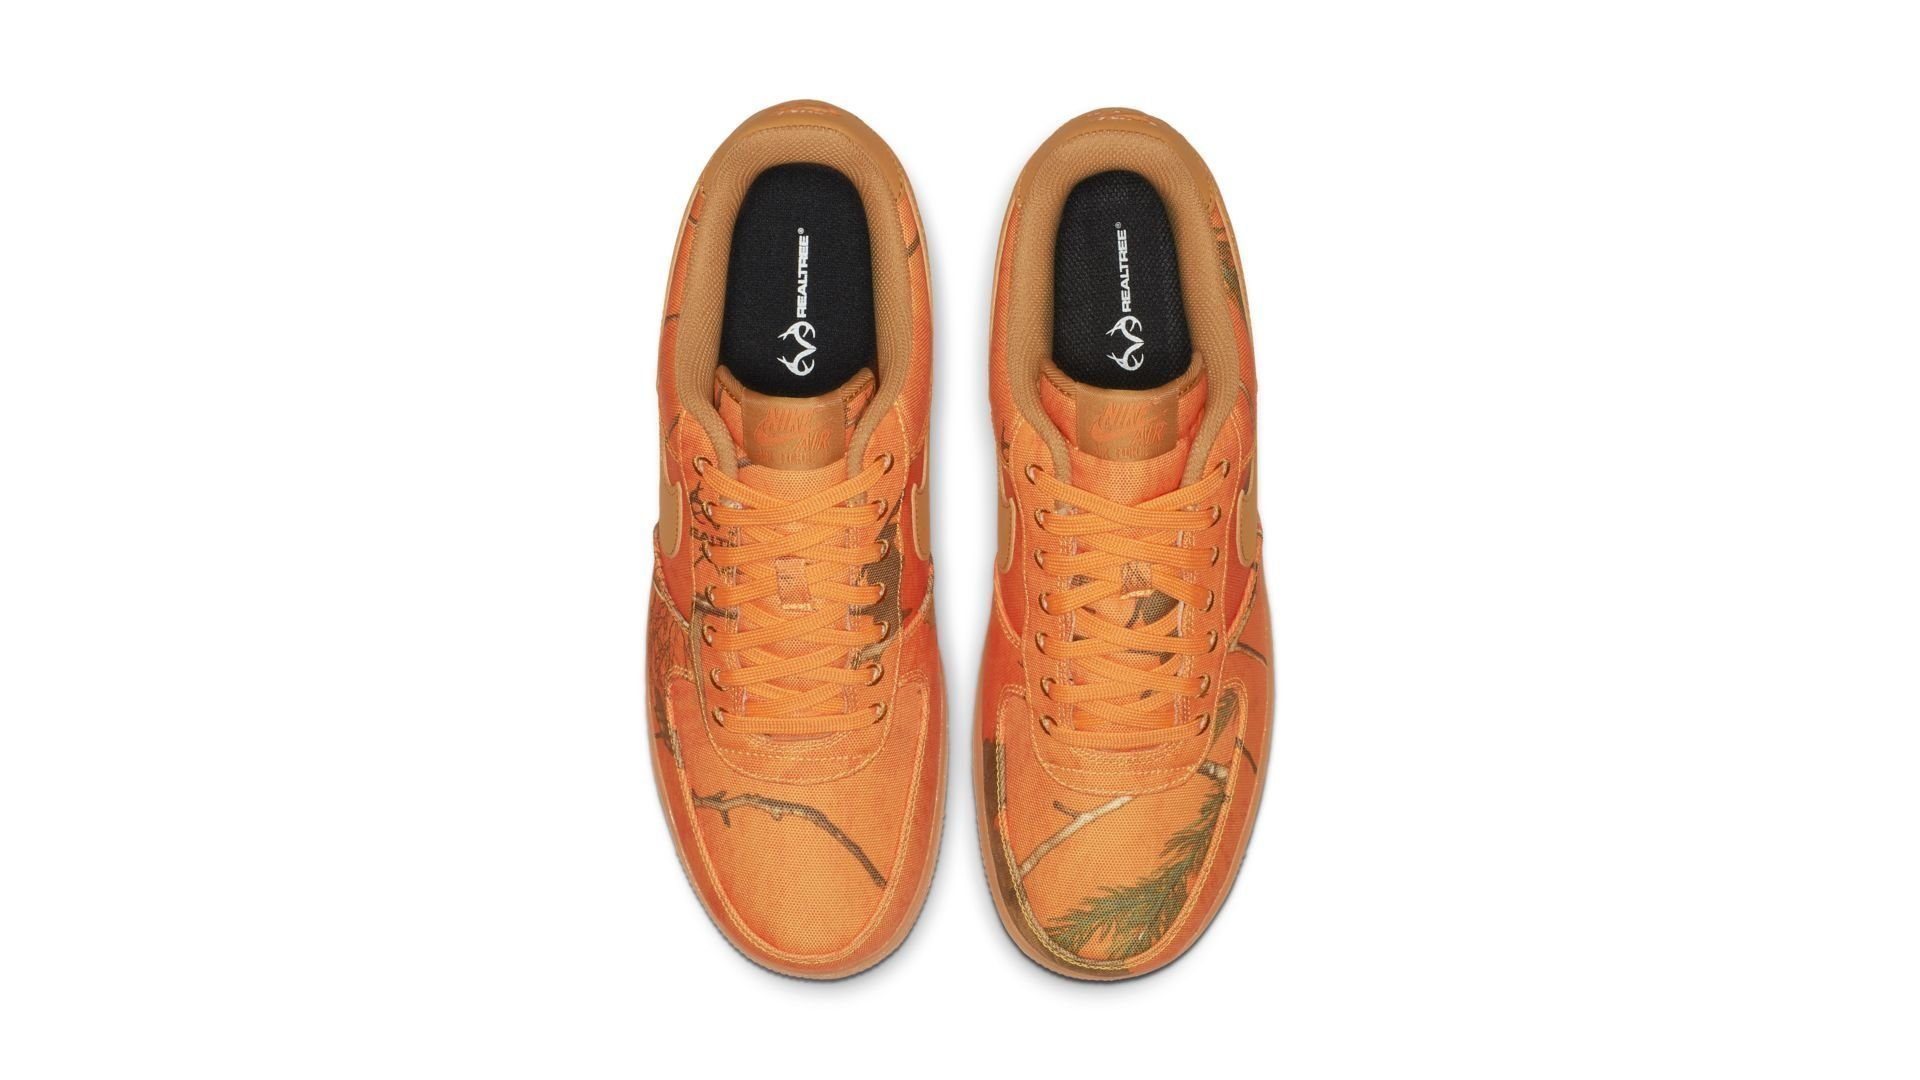 Nike Air Force 1 Low Realtree Orange (AO2441-800)